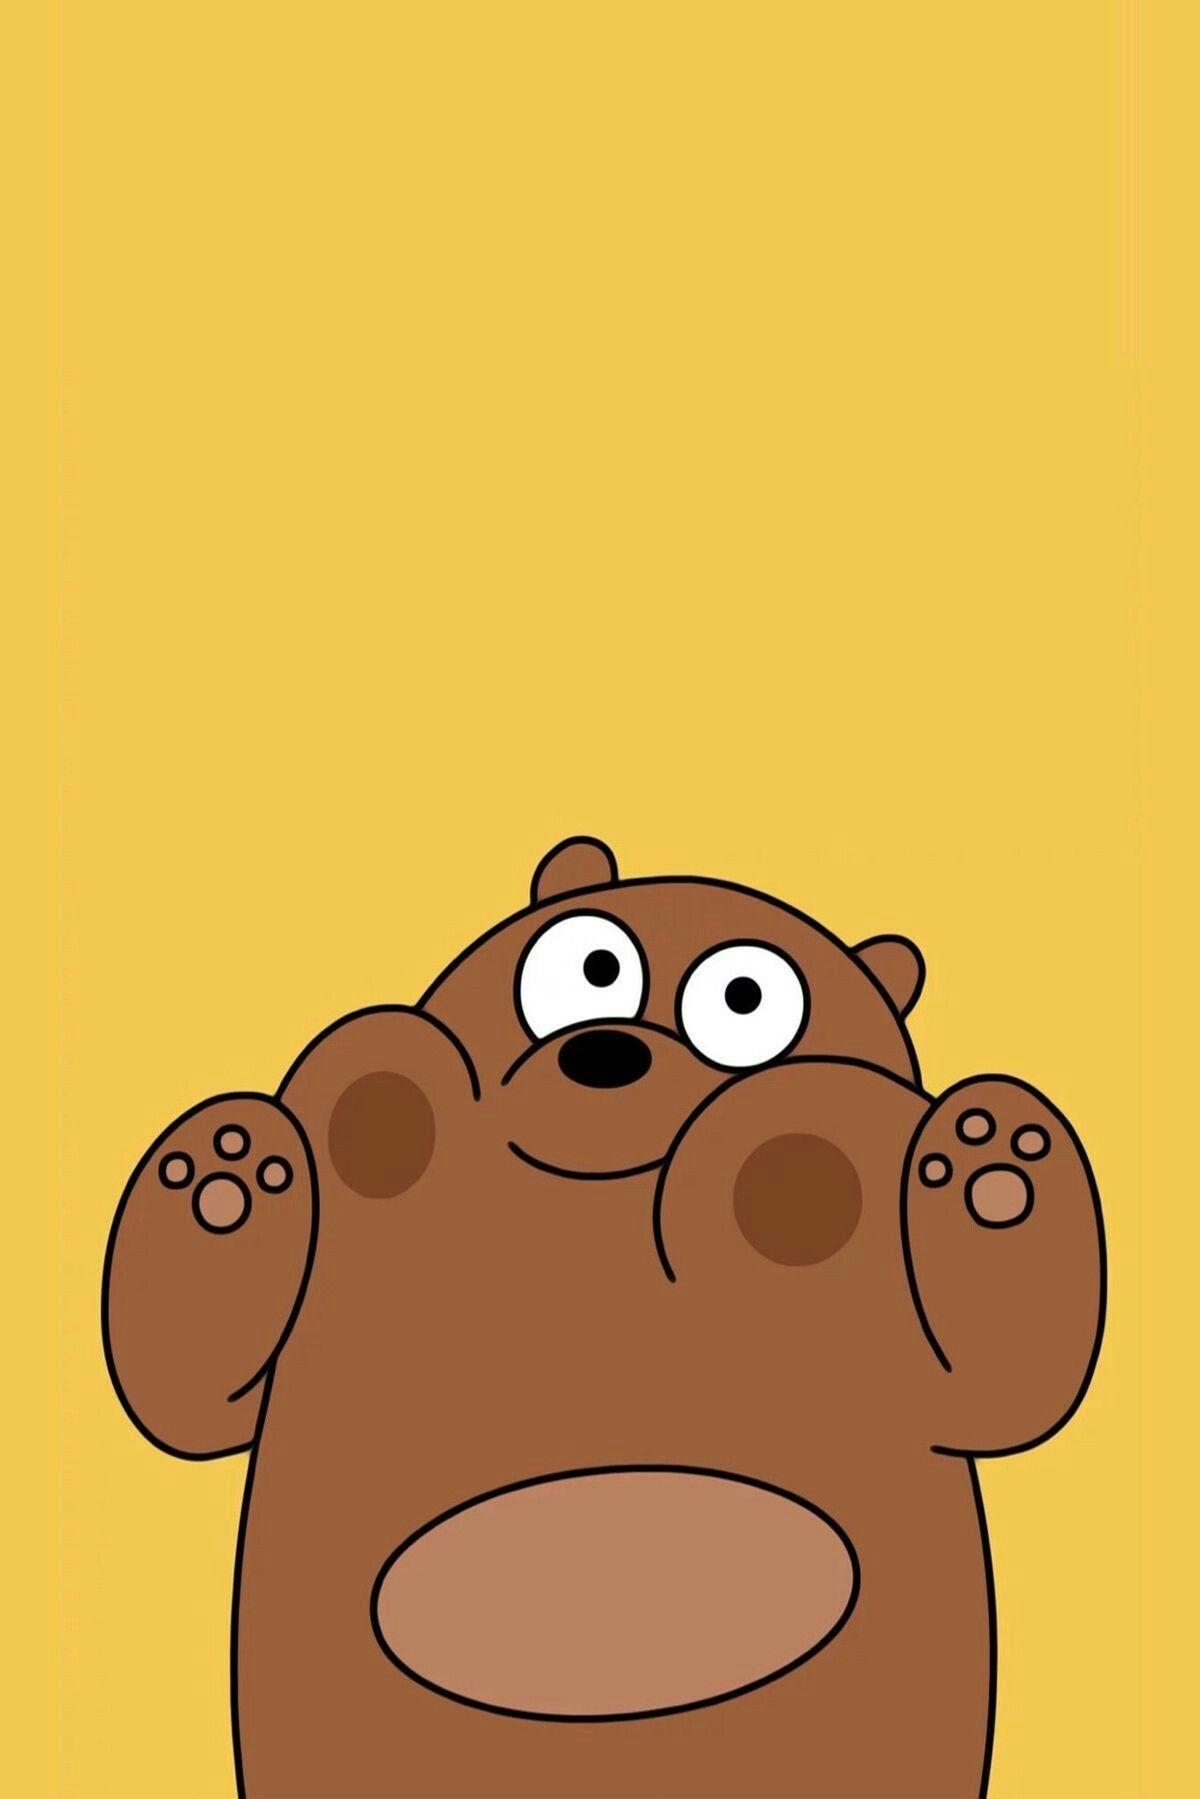 Teddy *Boo Bear* Poem By. Rarekivax